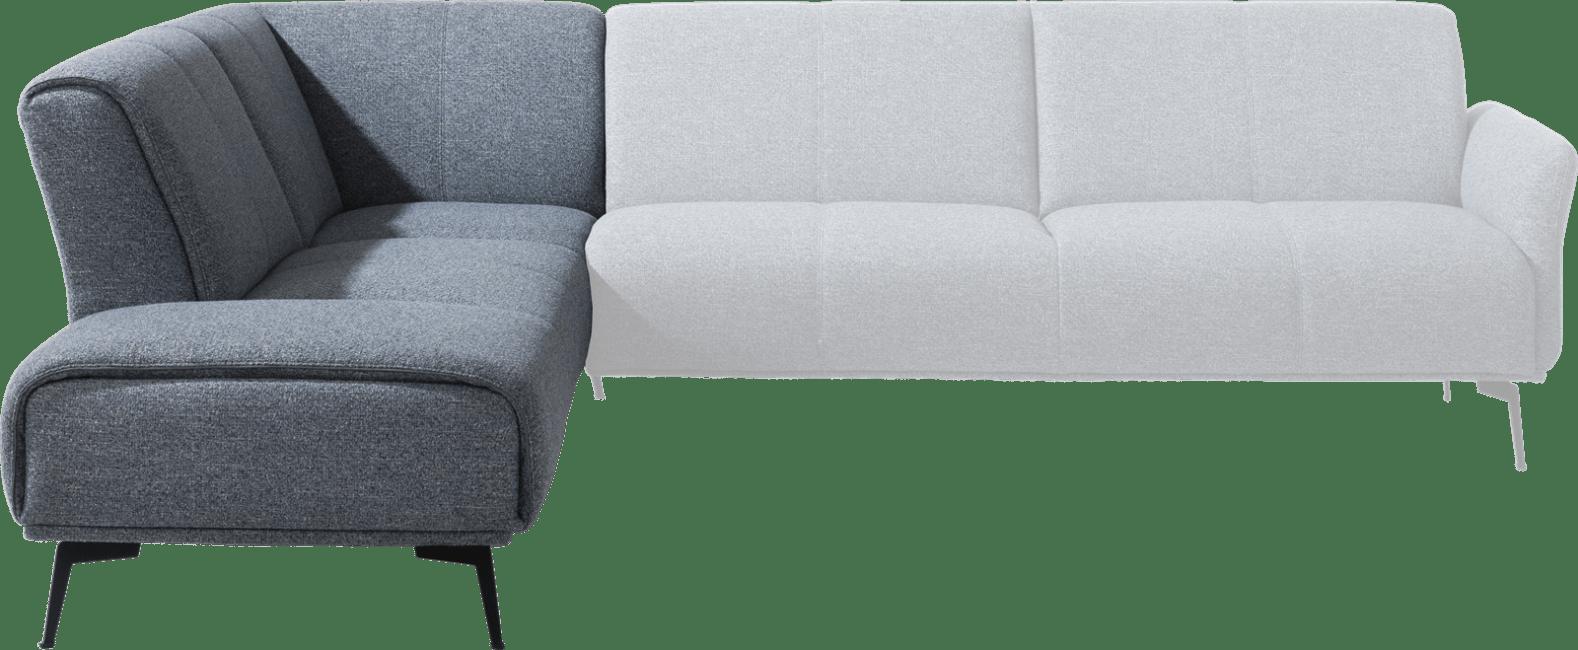 XOOON - Manarola - Design minimaliste - Toutes les canapés - ottomane gauche